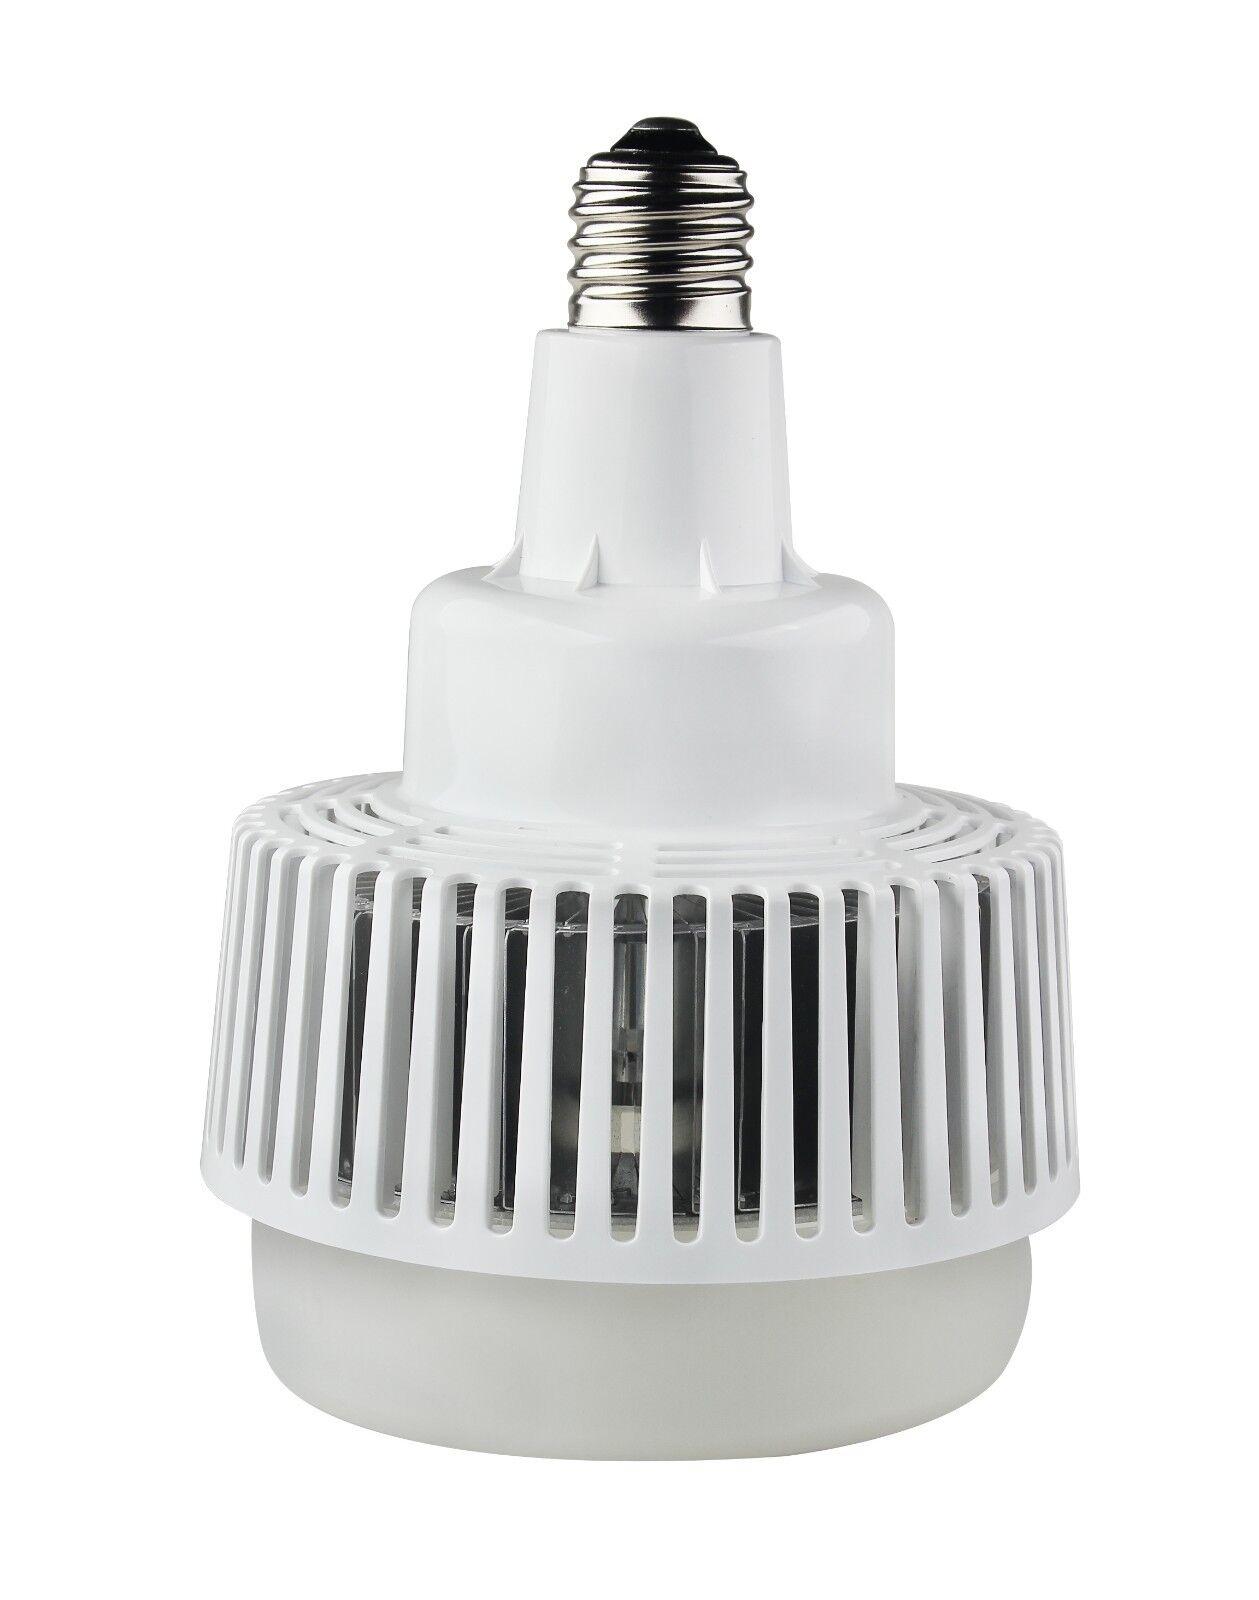 LED HIGH BAY CORN LIGHT retrofit 60W 80W 100W